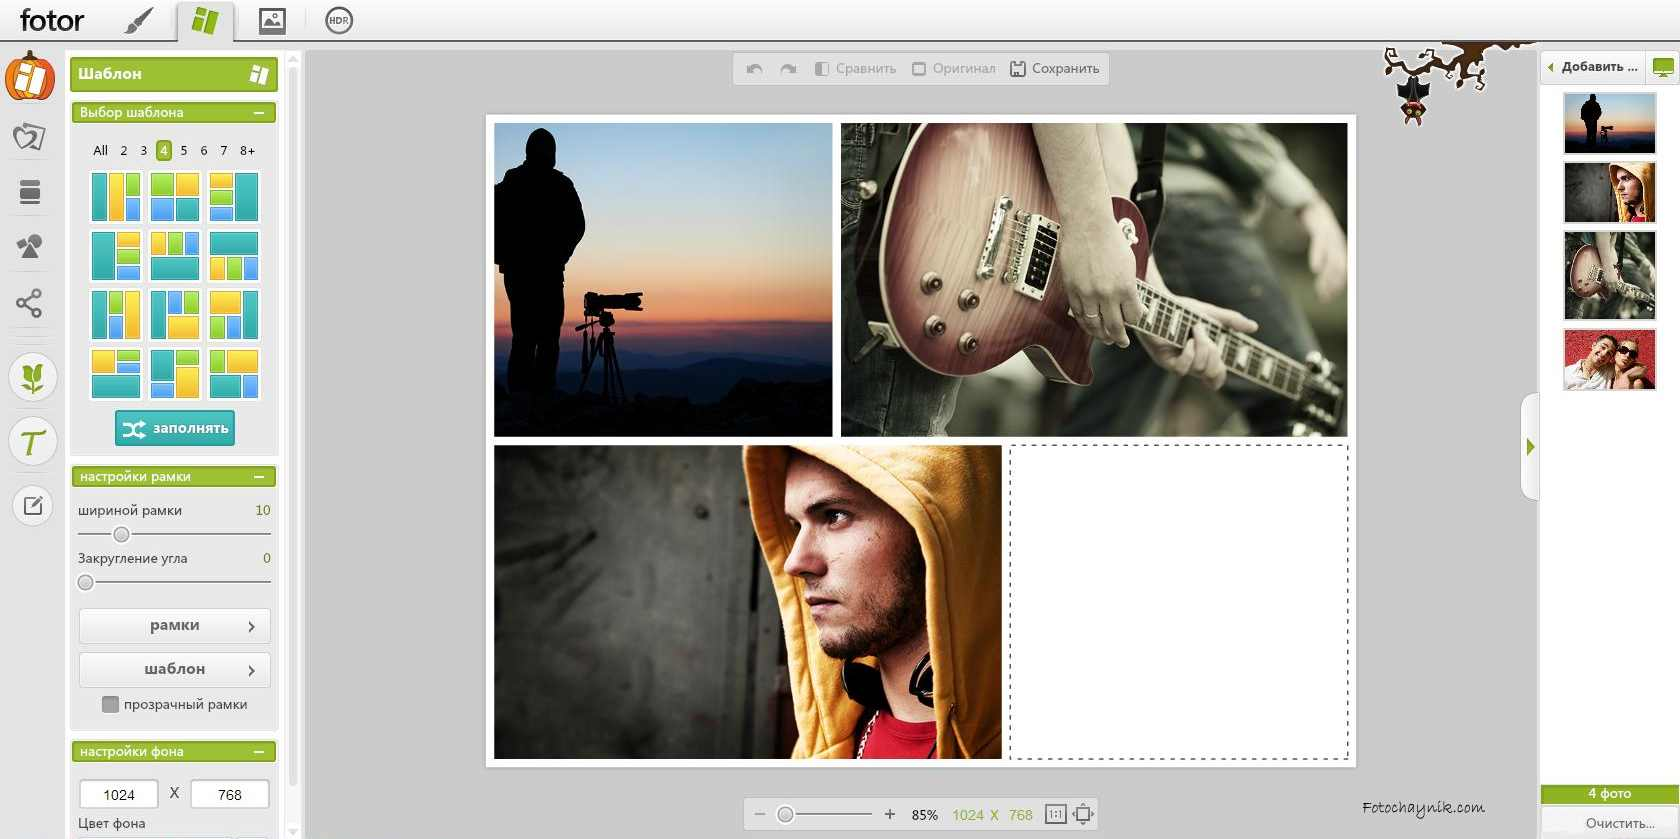 фотоколлаж онлайн бесплатно: